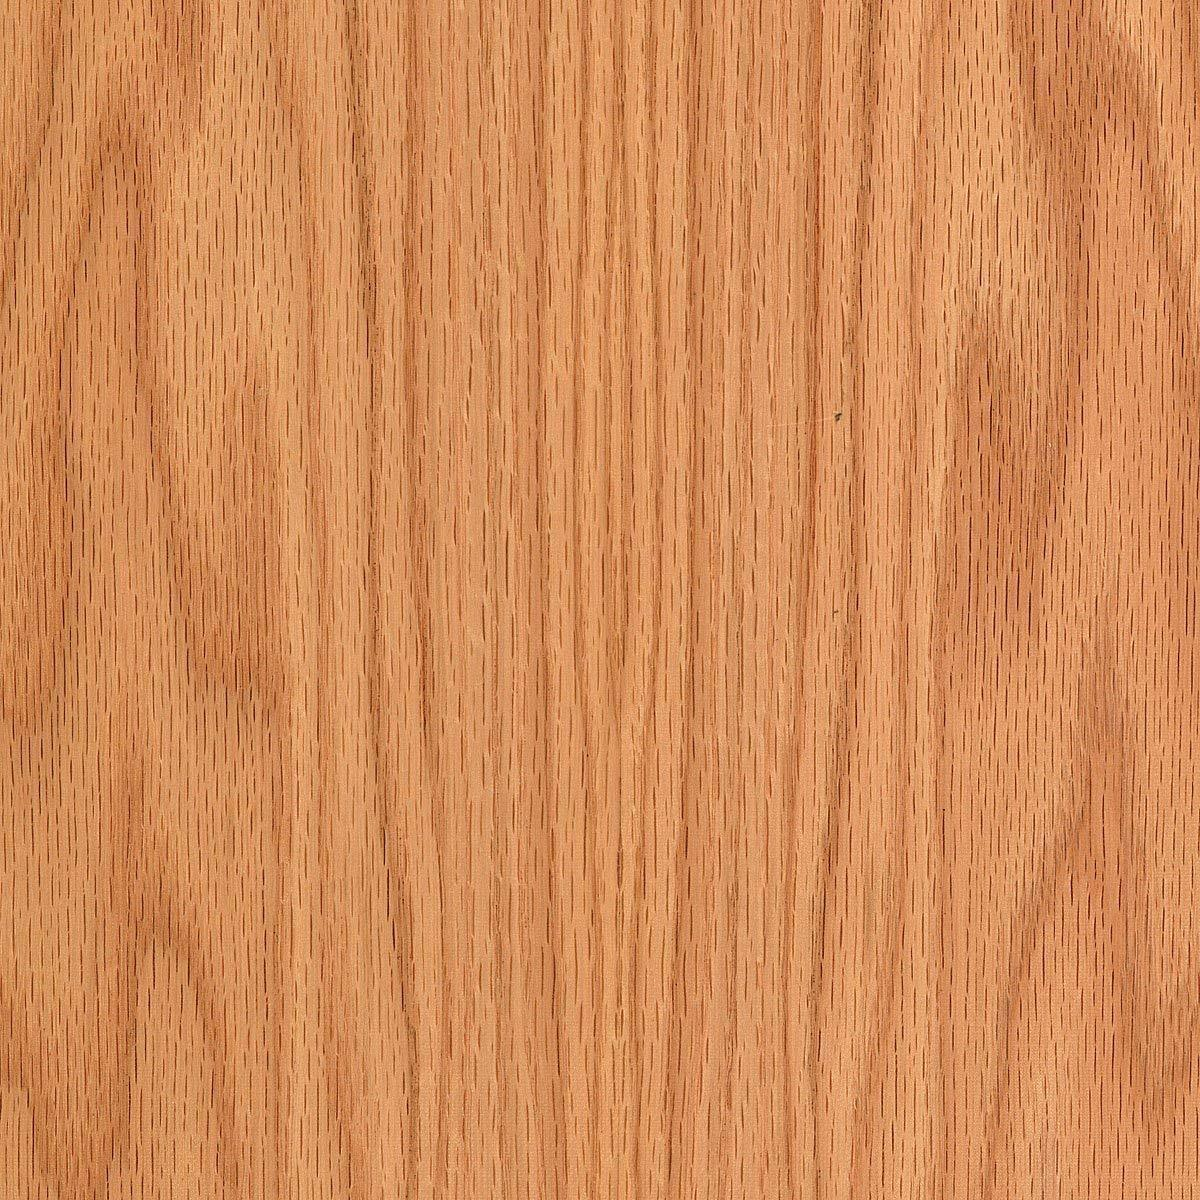 2440 x 1220 x 9mm Red Oak MDF